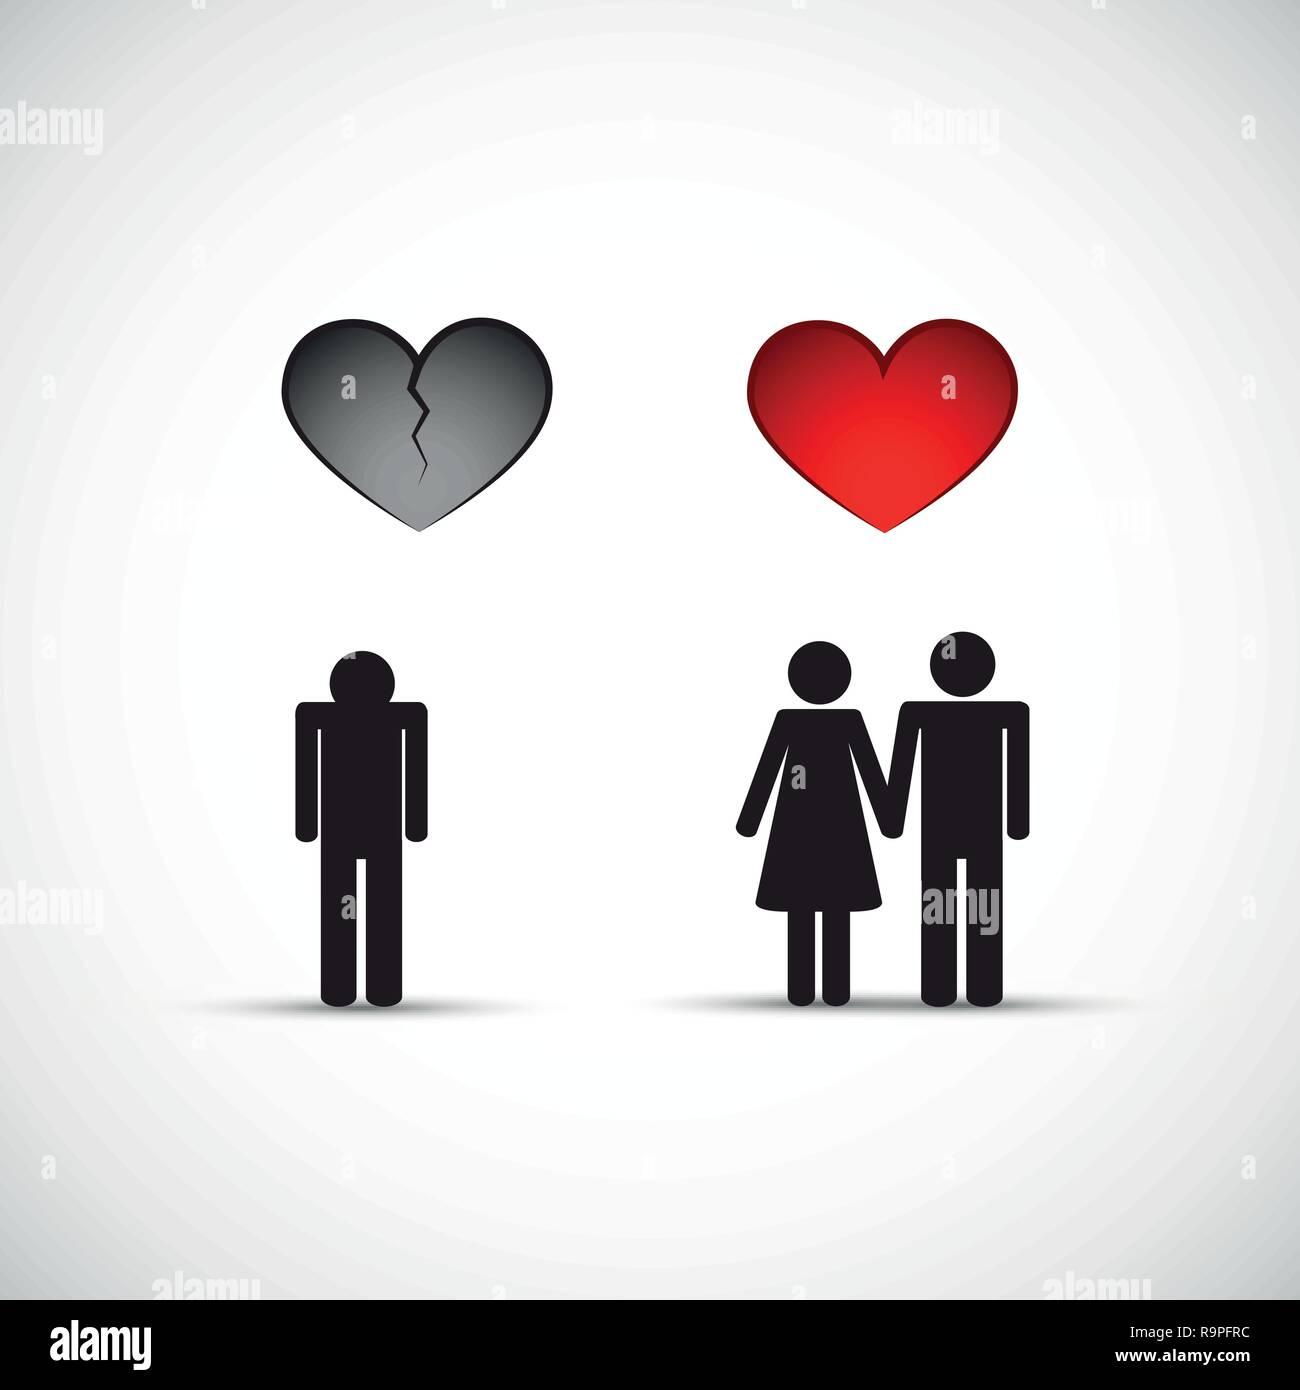 Divorce And New Relationship Broken Heart Sad Man Vector Illustration Eps10 Stock Vector Image Art Alamy